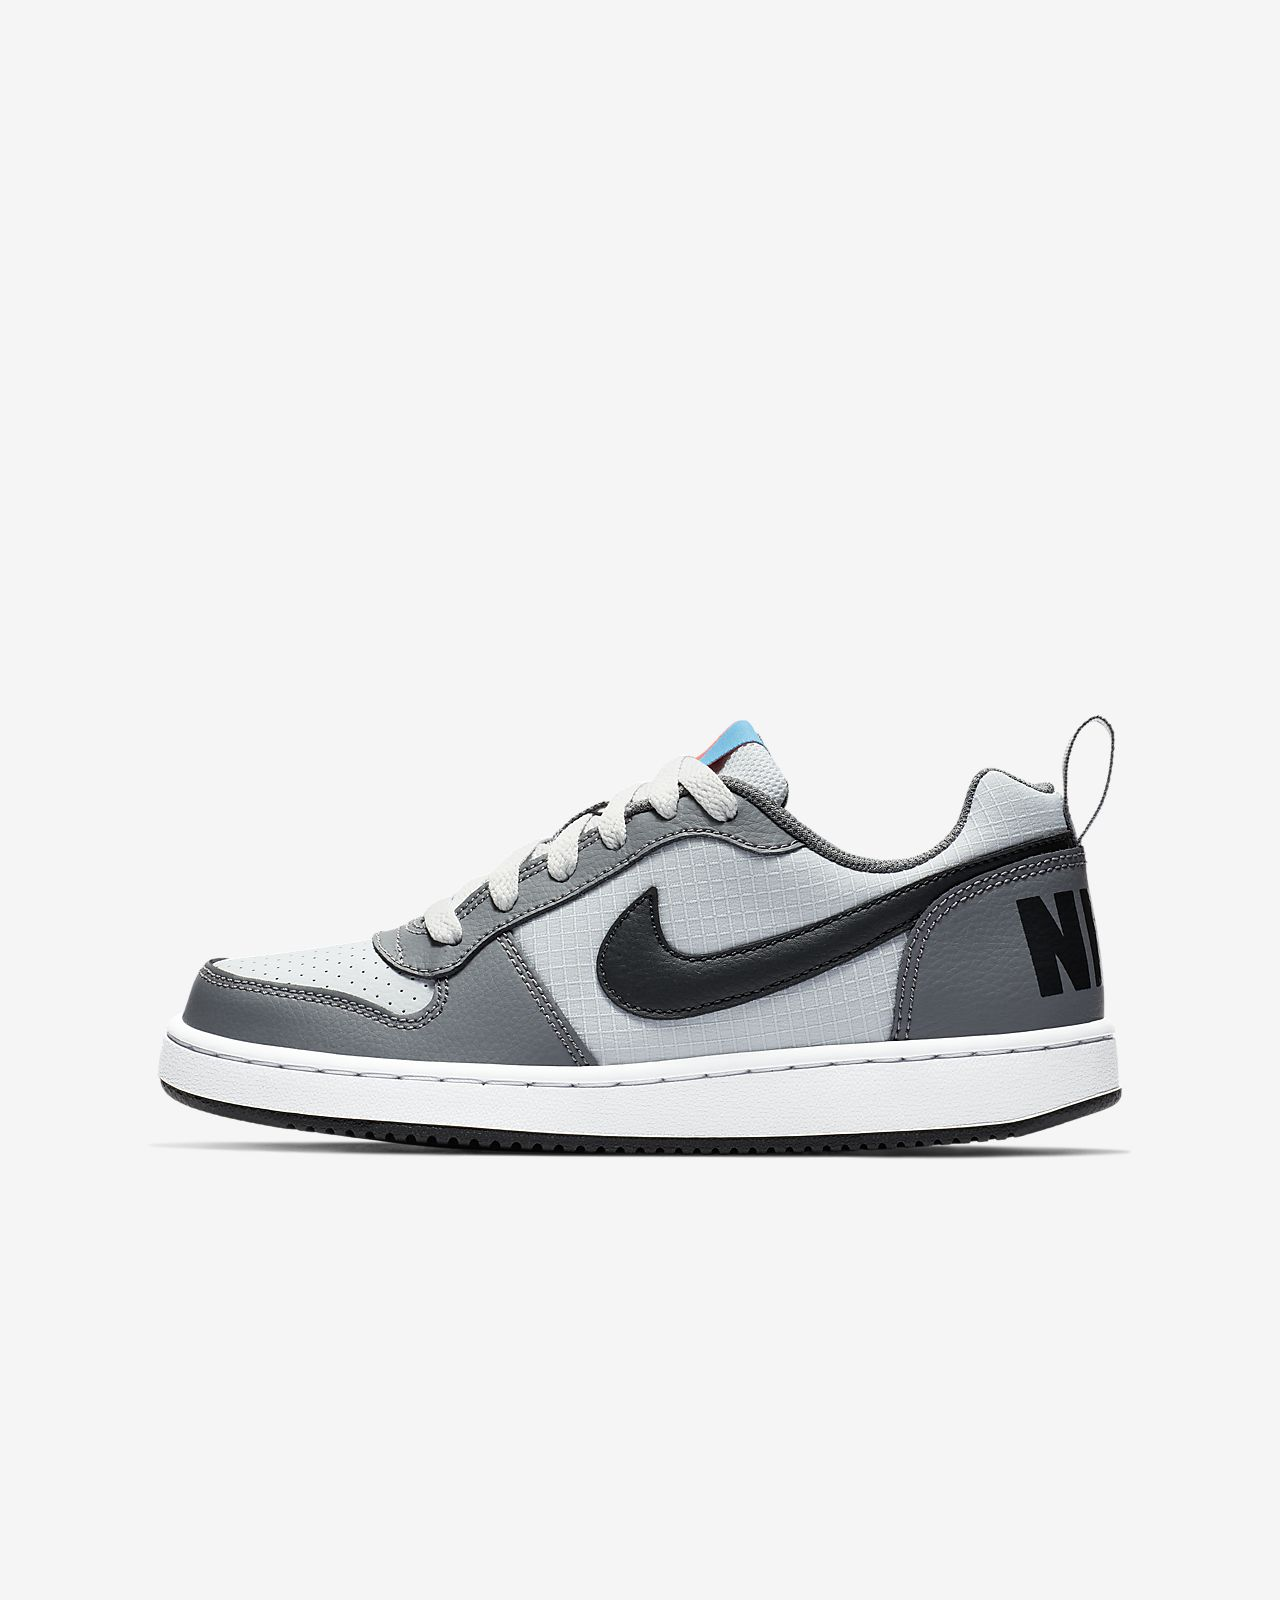 9787d9e2883 NikeCourt Borough Low Older Kids  Shoe. Nike.com GB